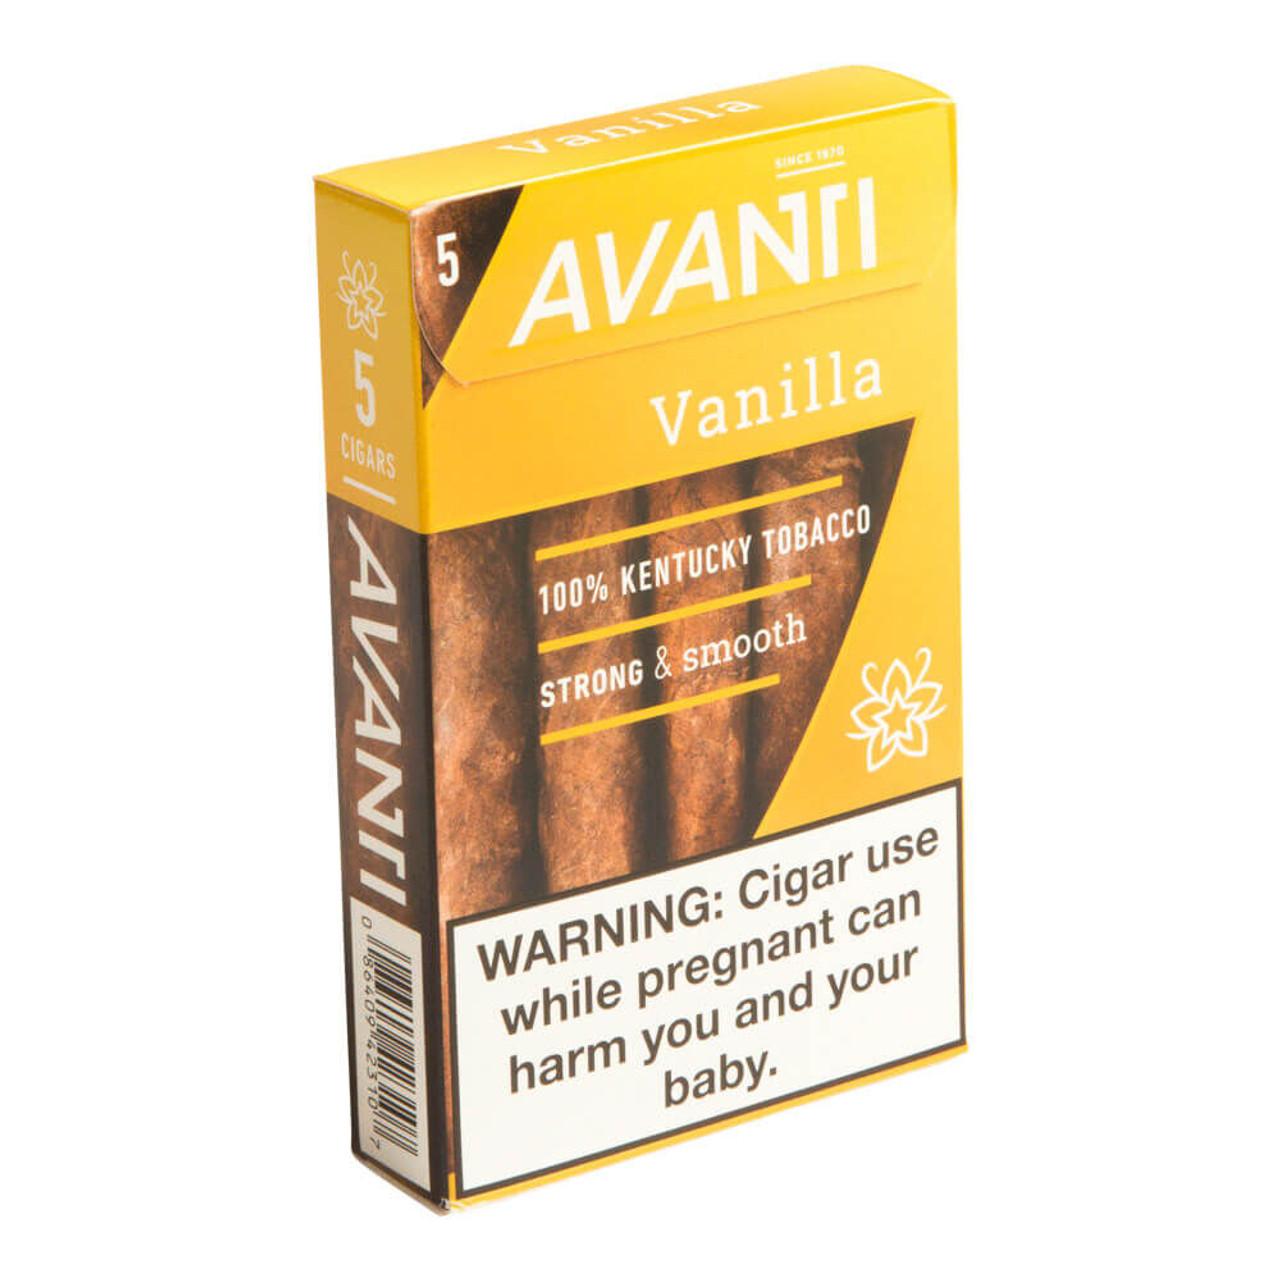 Avanti Vanilla Cigars - 4.25 x 34 (10 Packs of 5 (50 total))